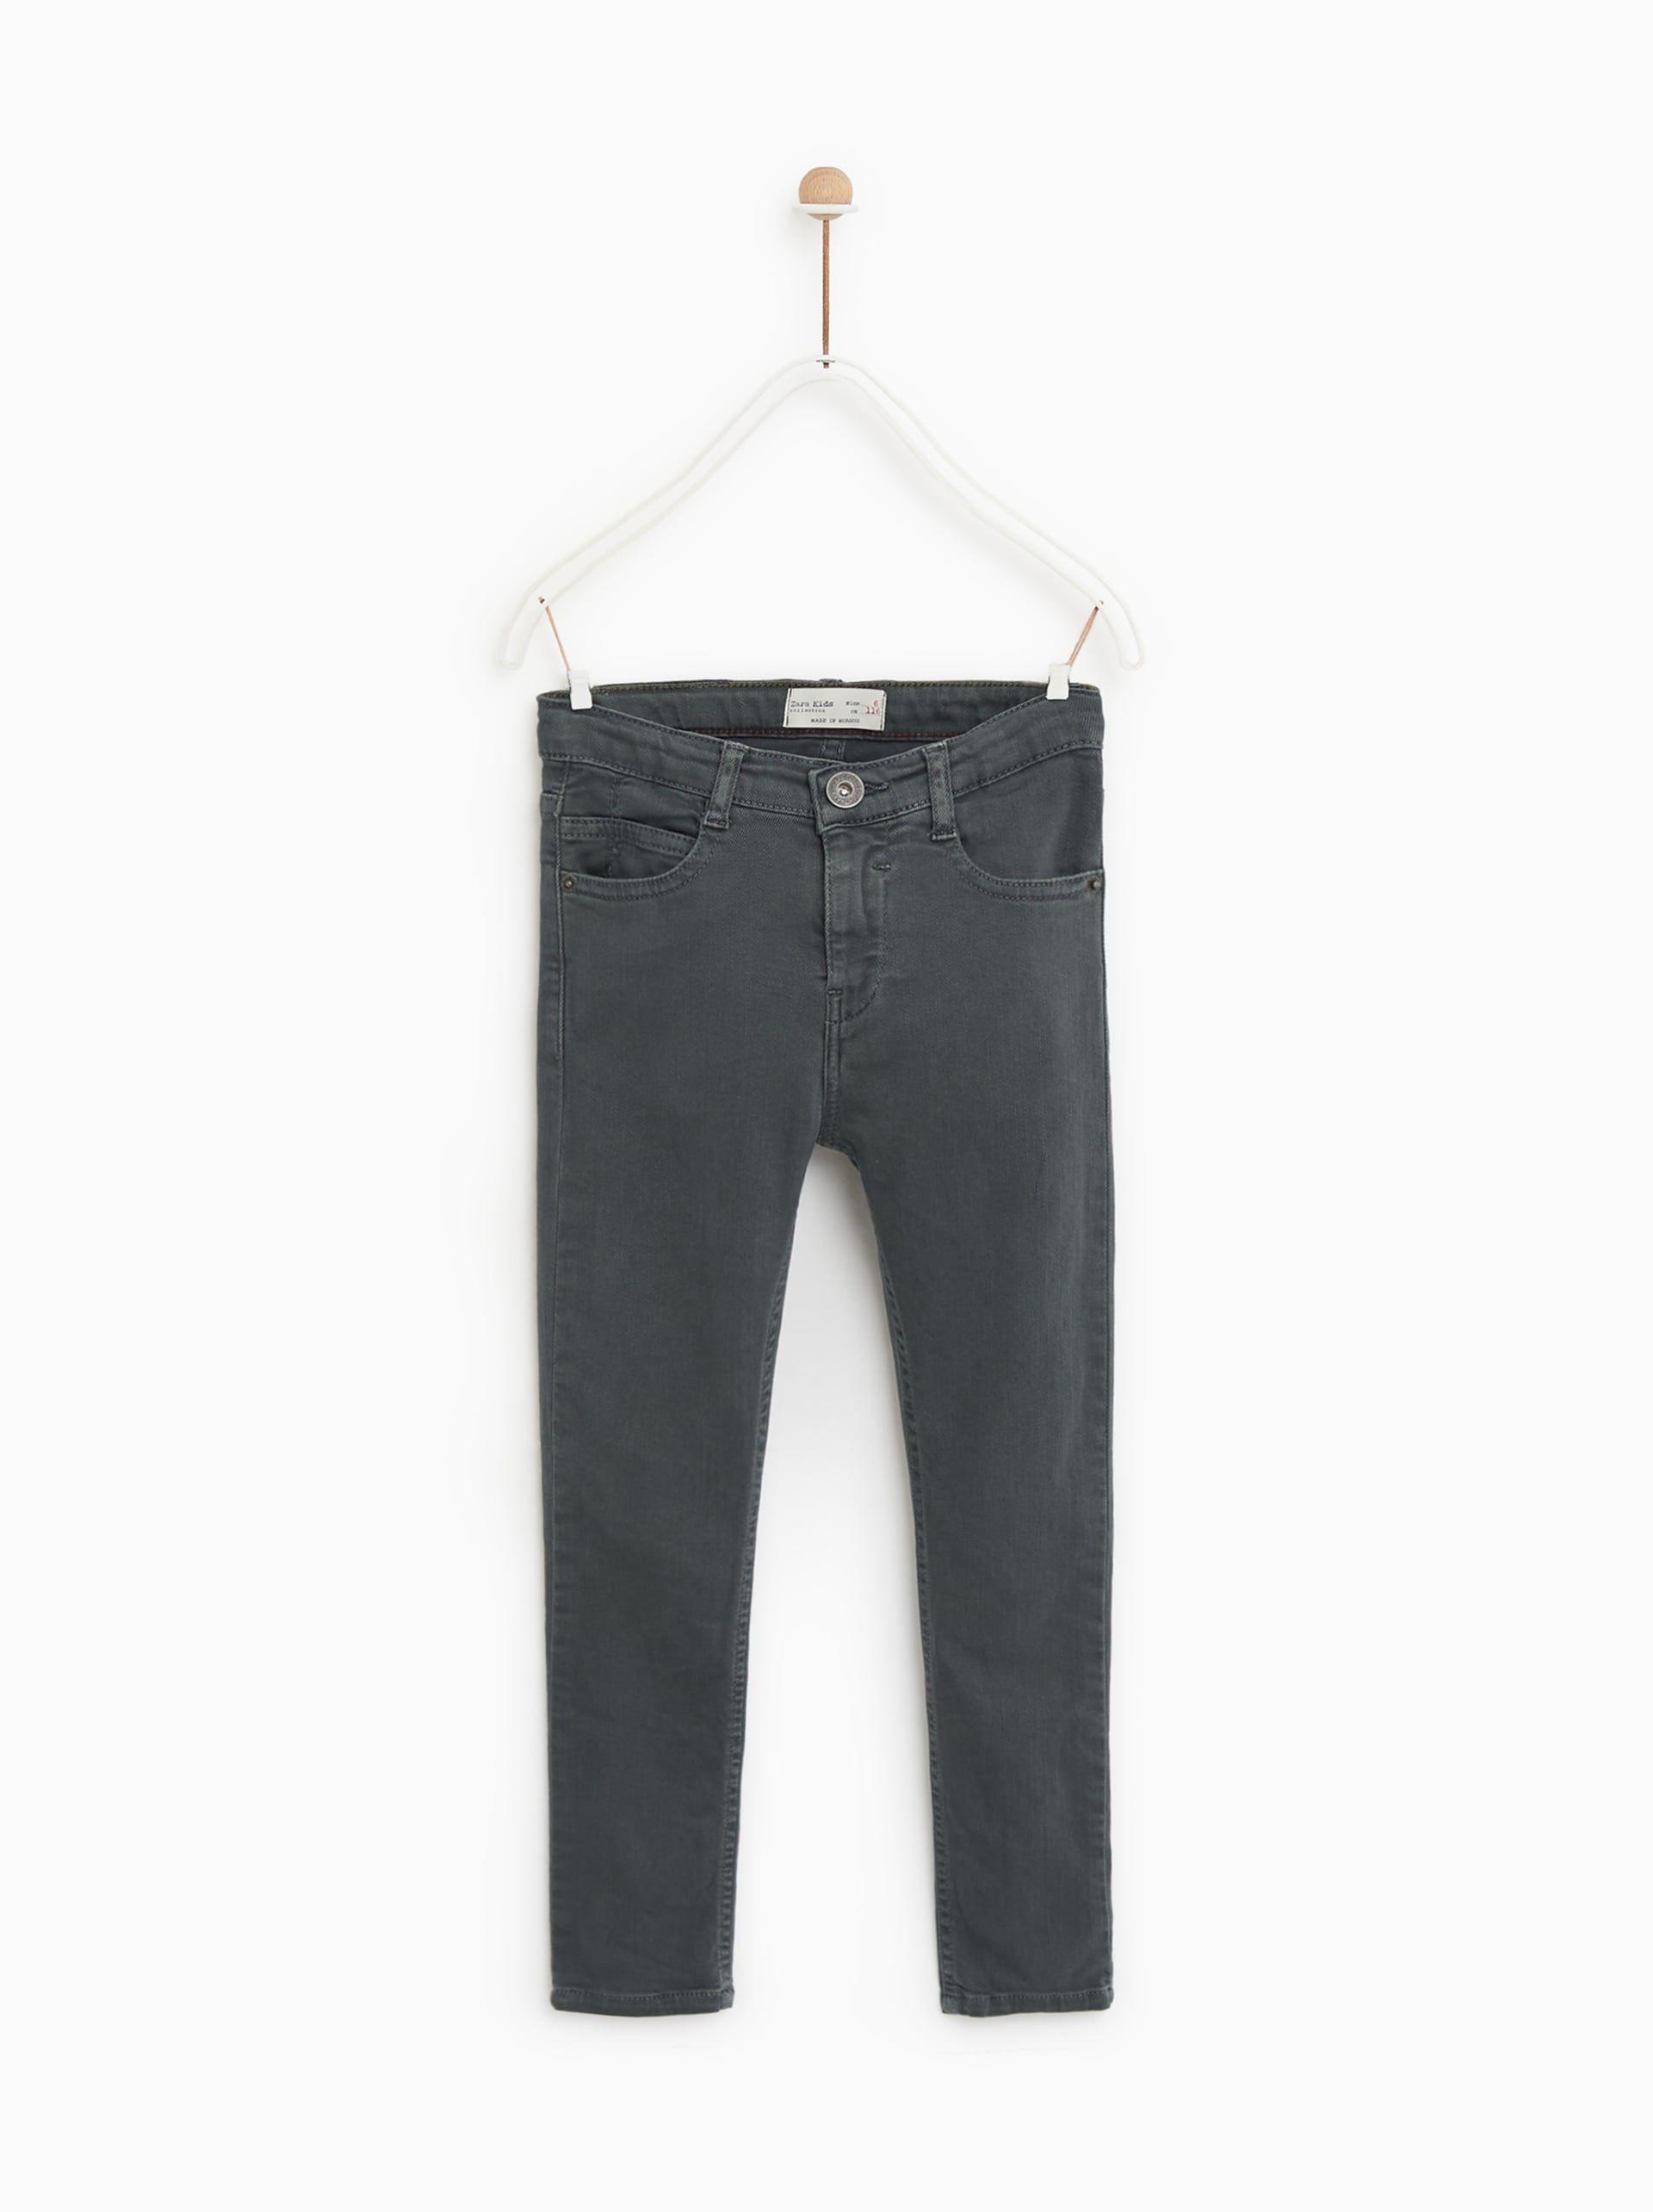 919dc6f23 Shorts Sale, Kids Boys, Natural Colors, Boy Outfits